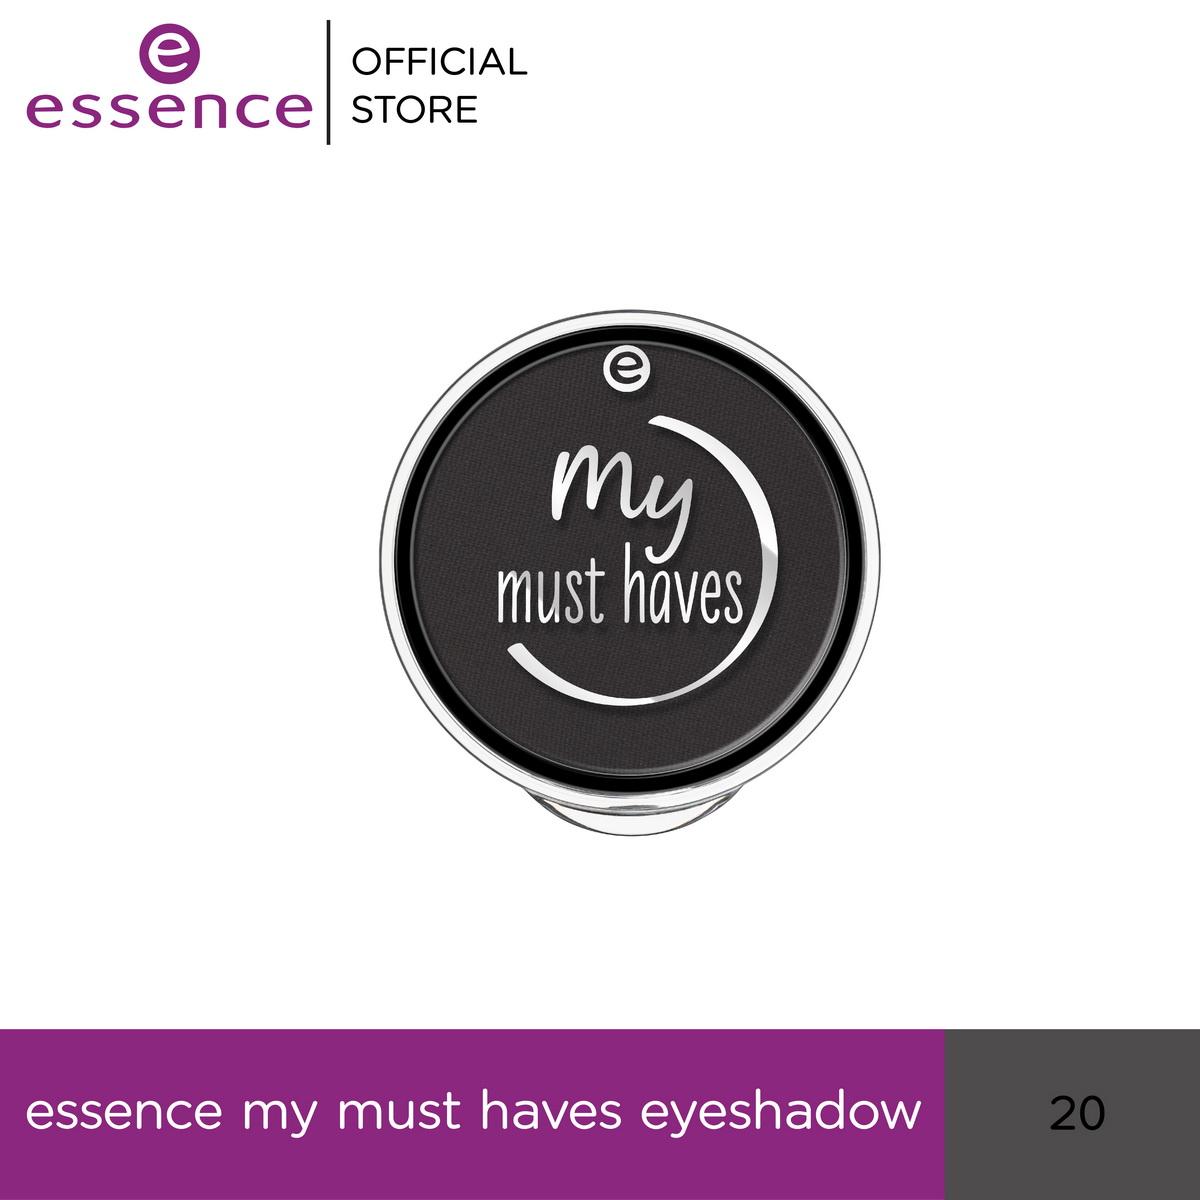 ess.my must haves eyeshadow 20